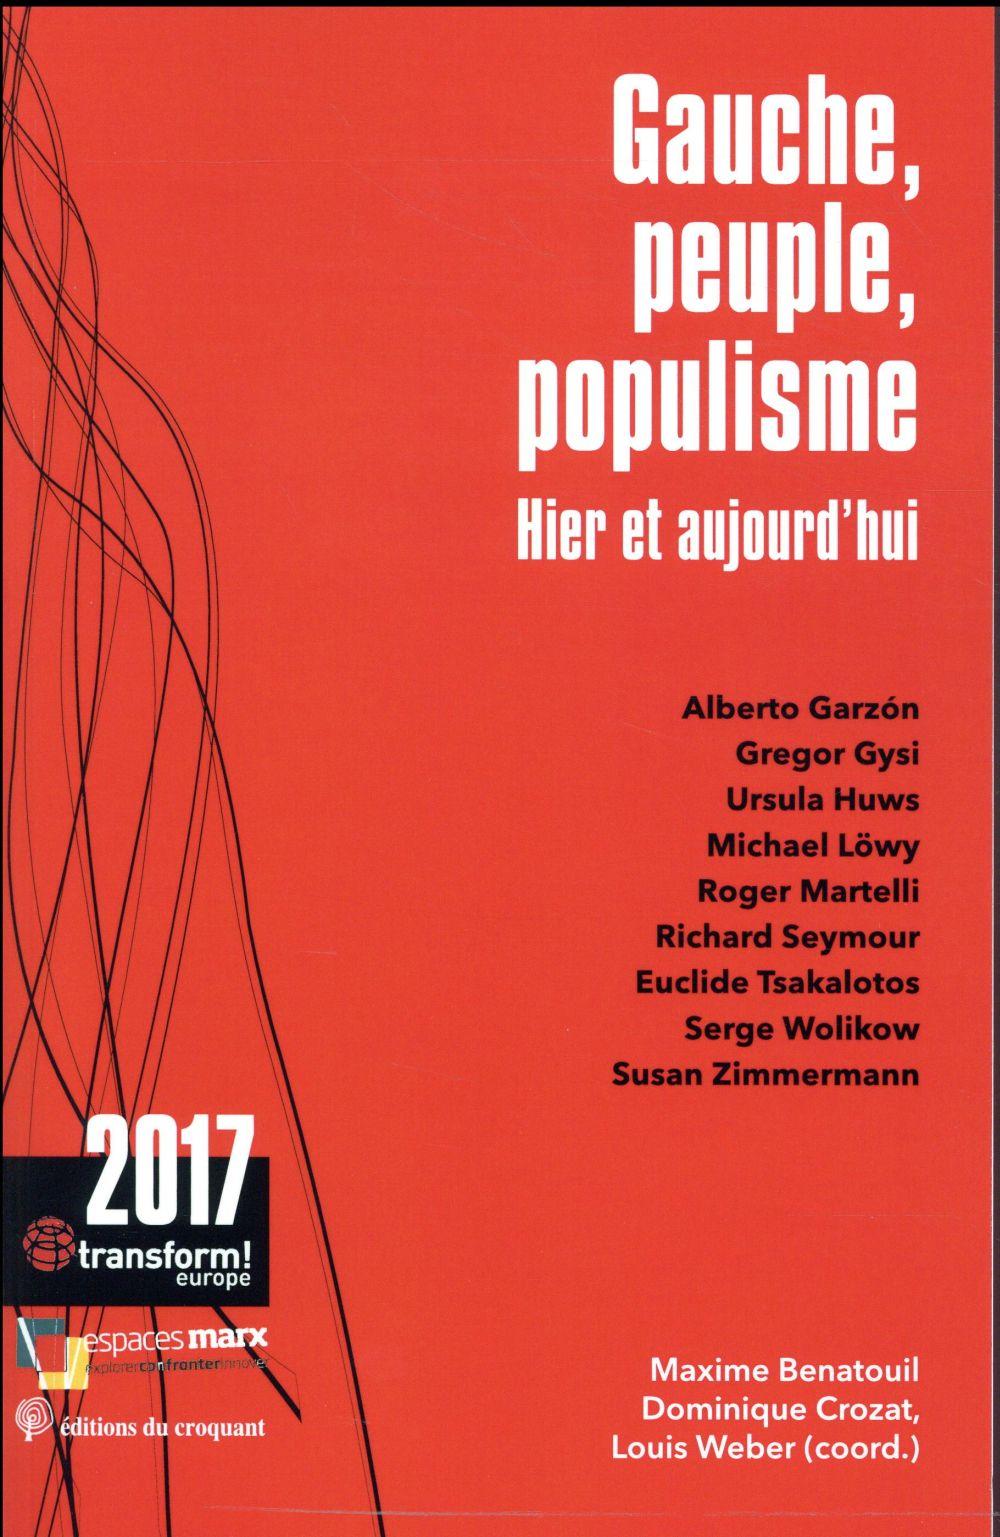 Gauche, peuple, populisme